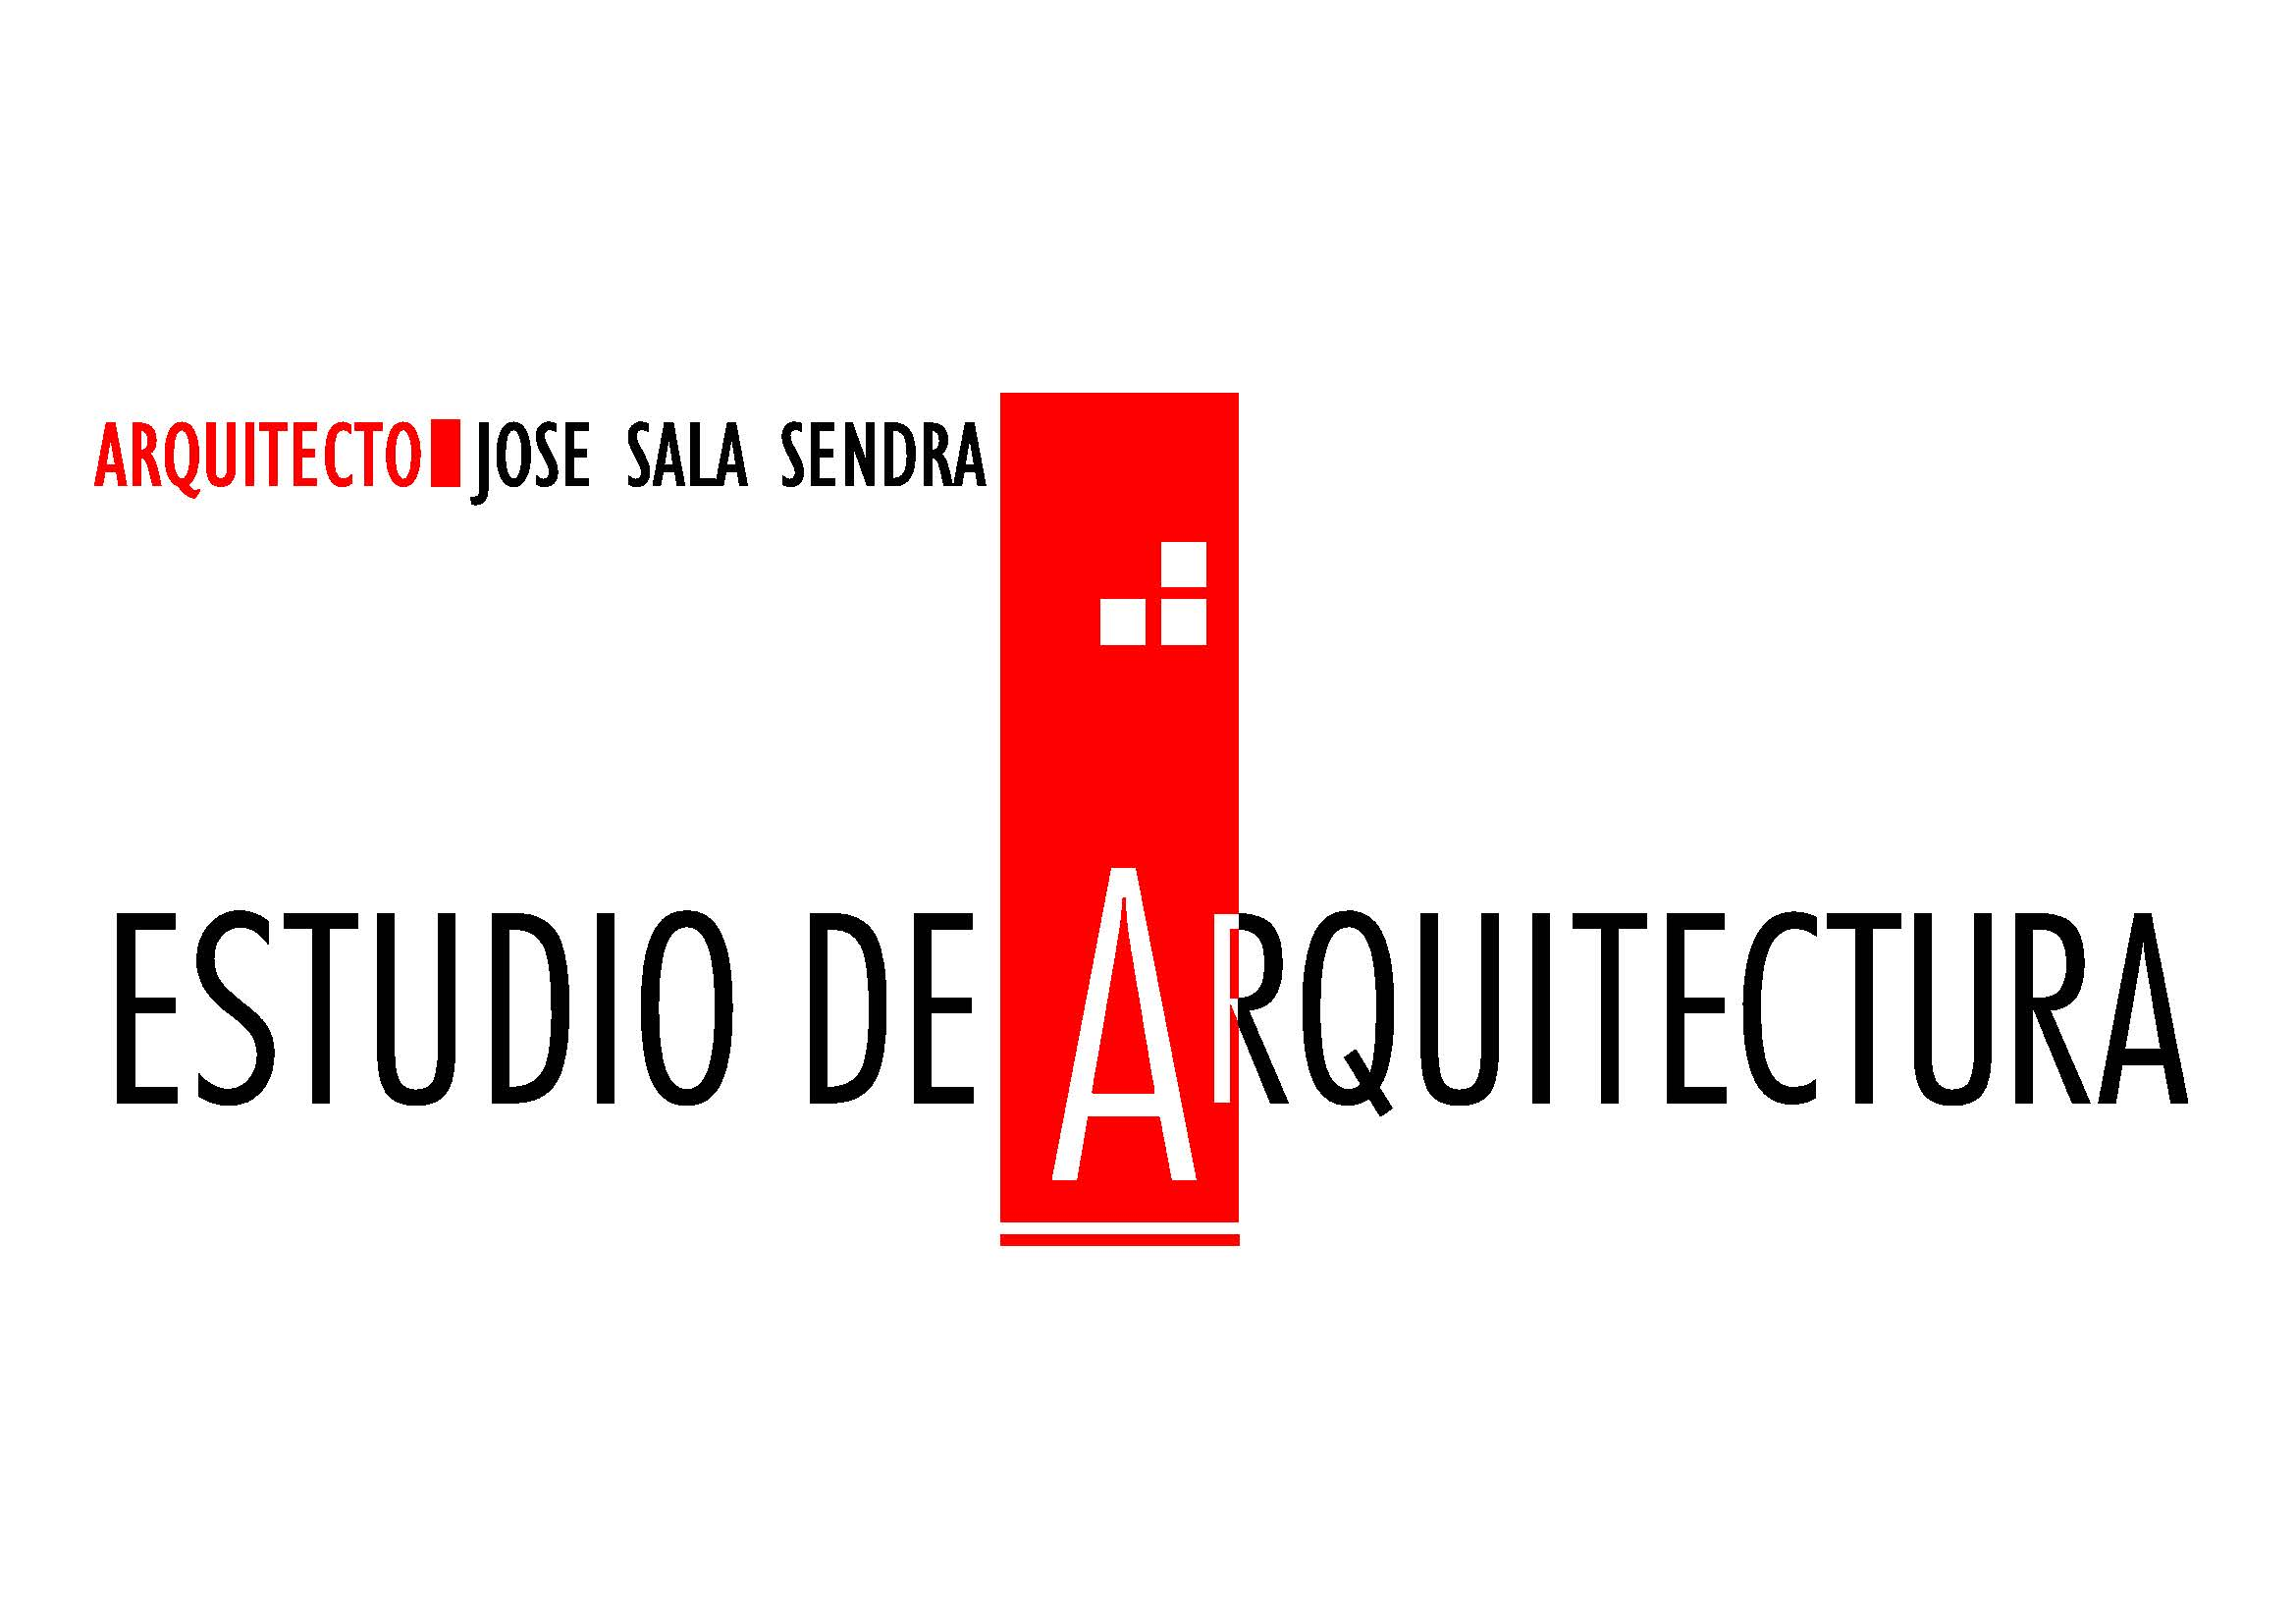 Proyectos de jose sala sendra slp profesional de la for Logo arquitectura tecnica